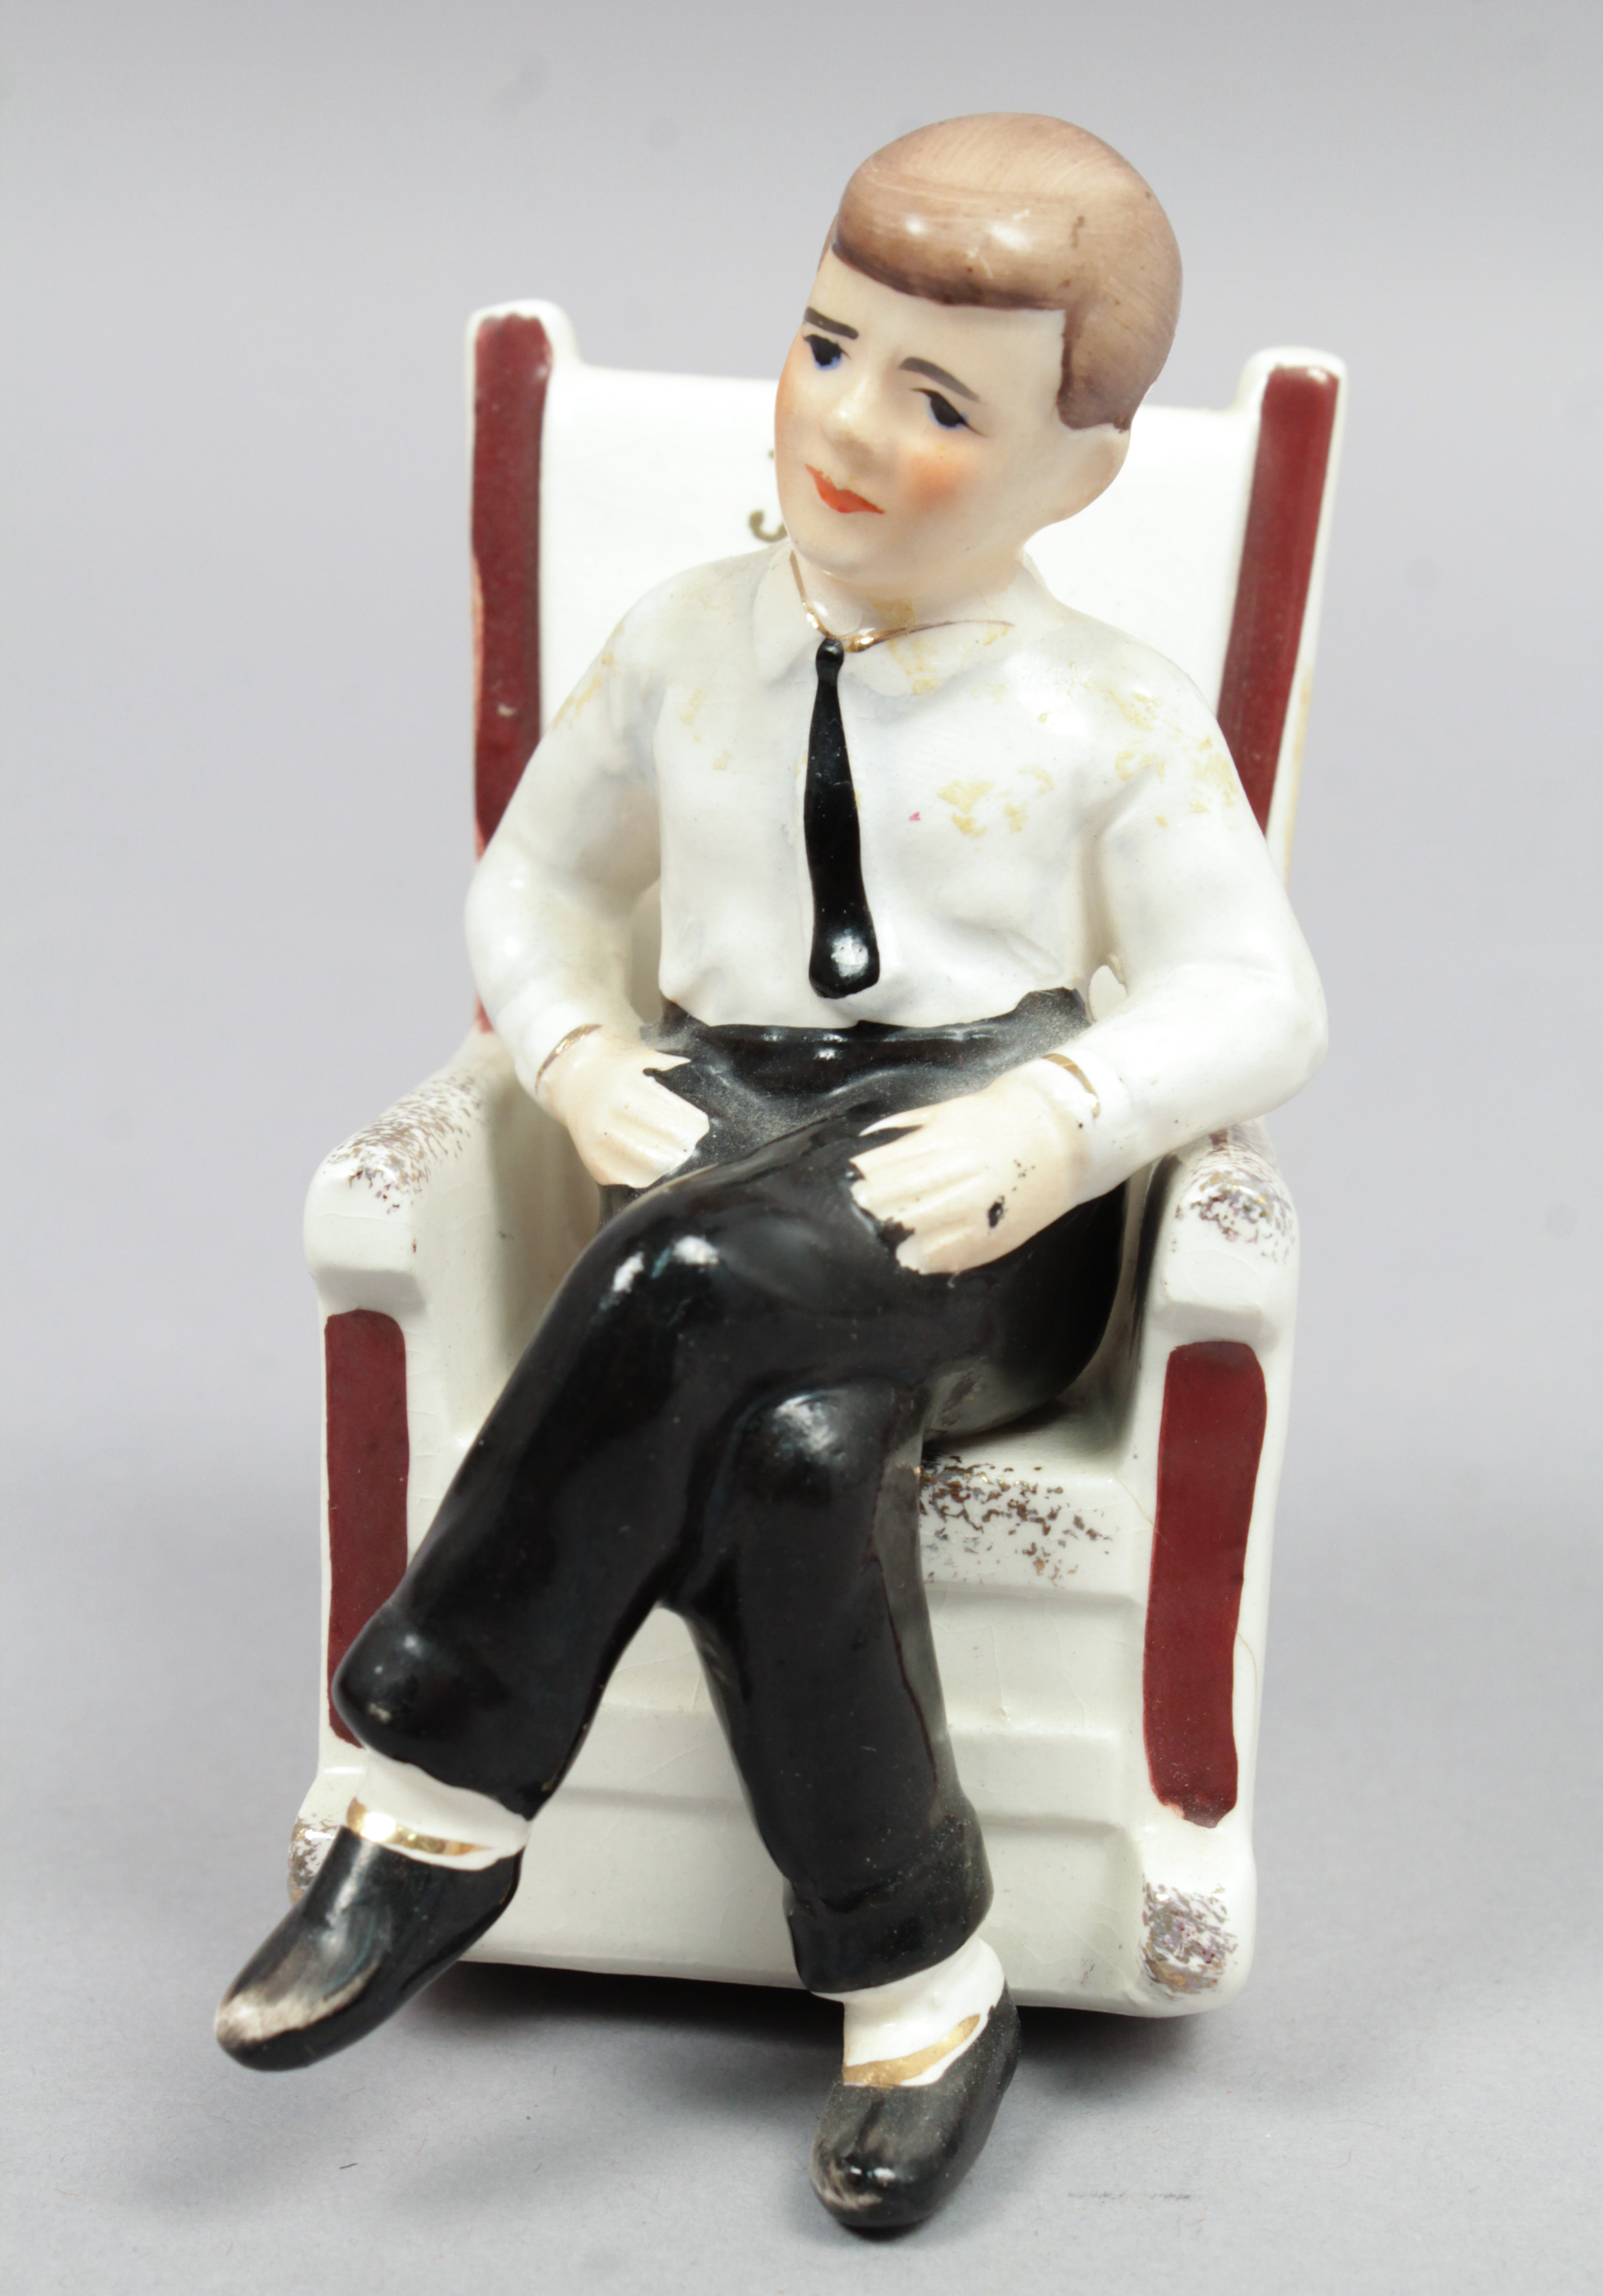 jfk rocking chair spandex covers black vintage 1962 japanese president kennedy in